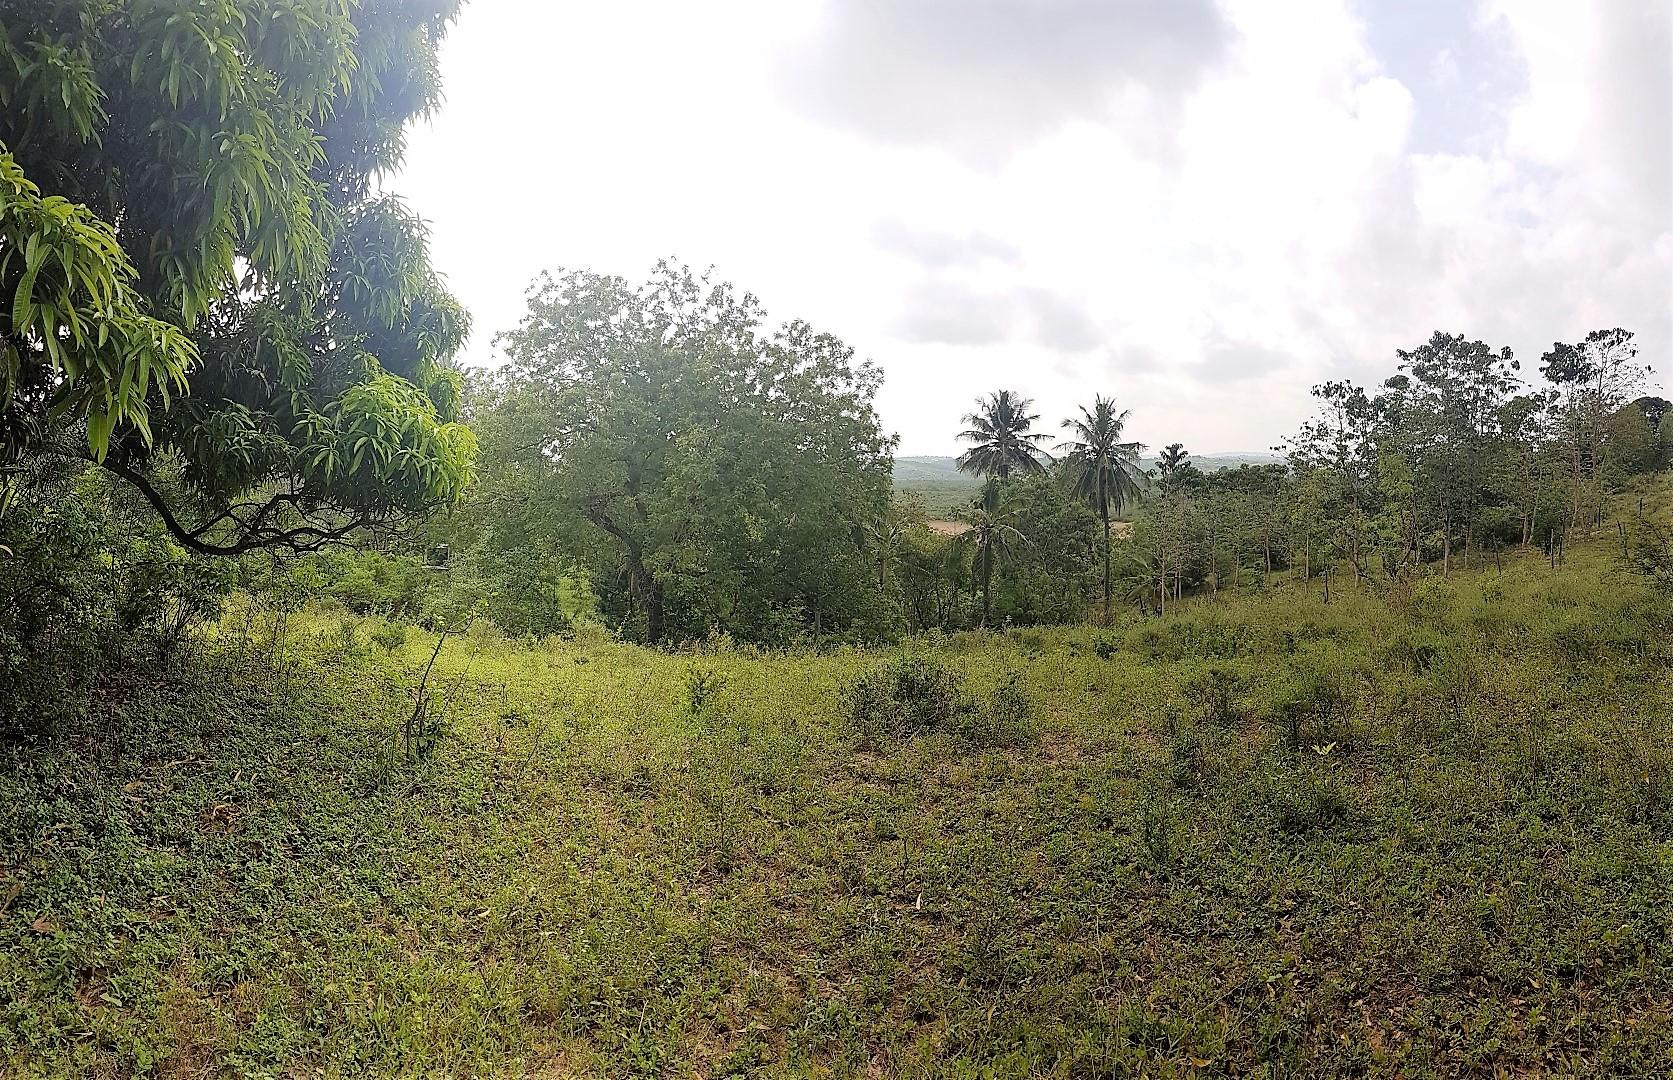 Half acre plot for sale in Mtwapa/Mtomondoni